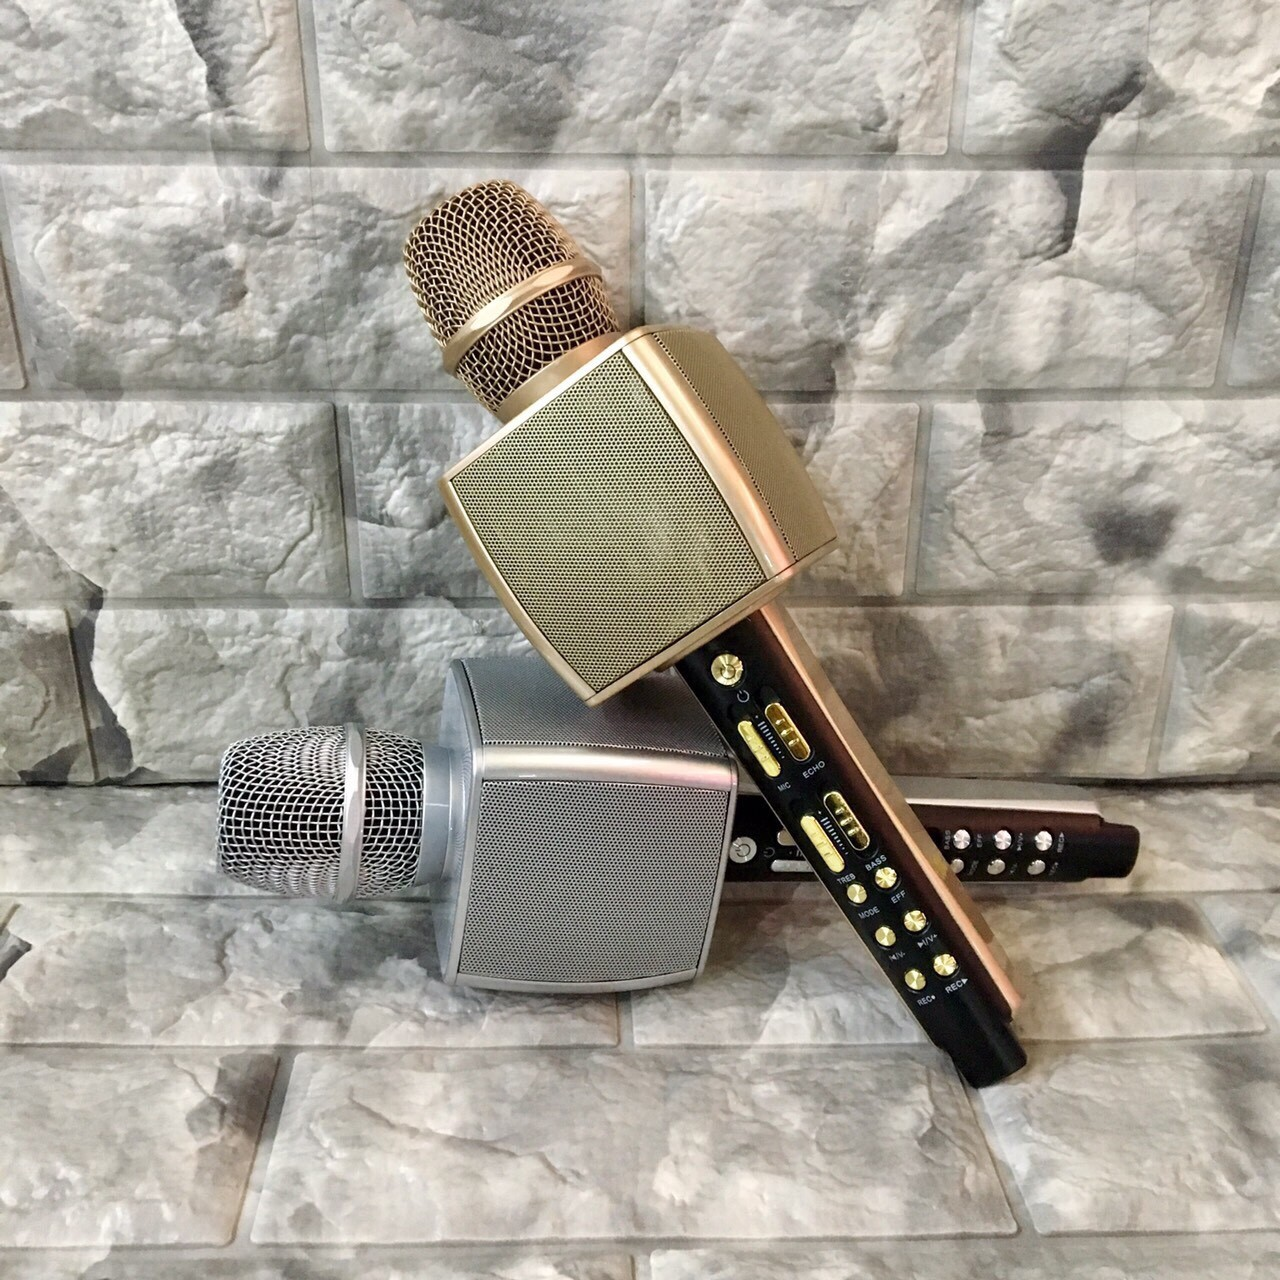 Micro karaoke ys92 mic livetream thu âm karaoke di động kiêm loa trợ giảng - MICRO YS92